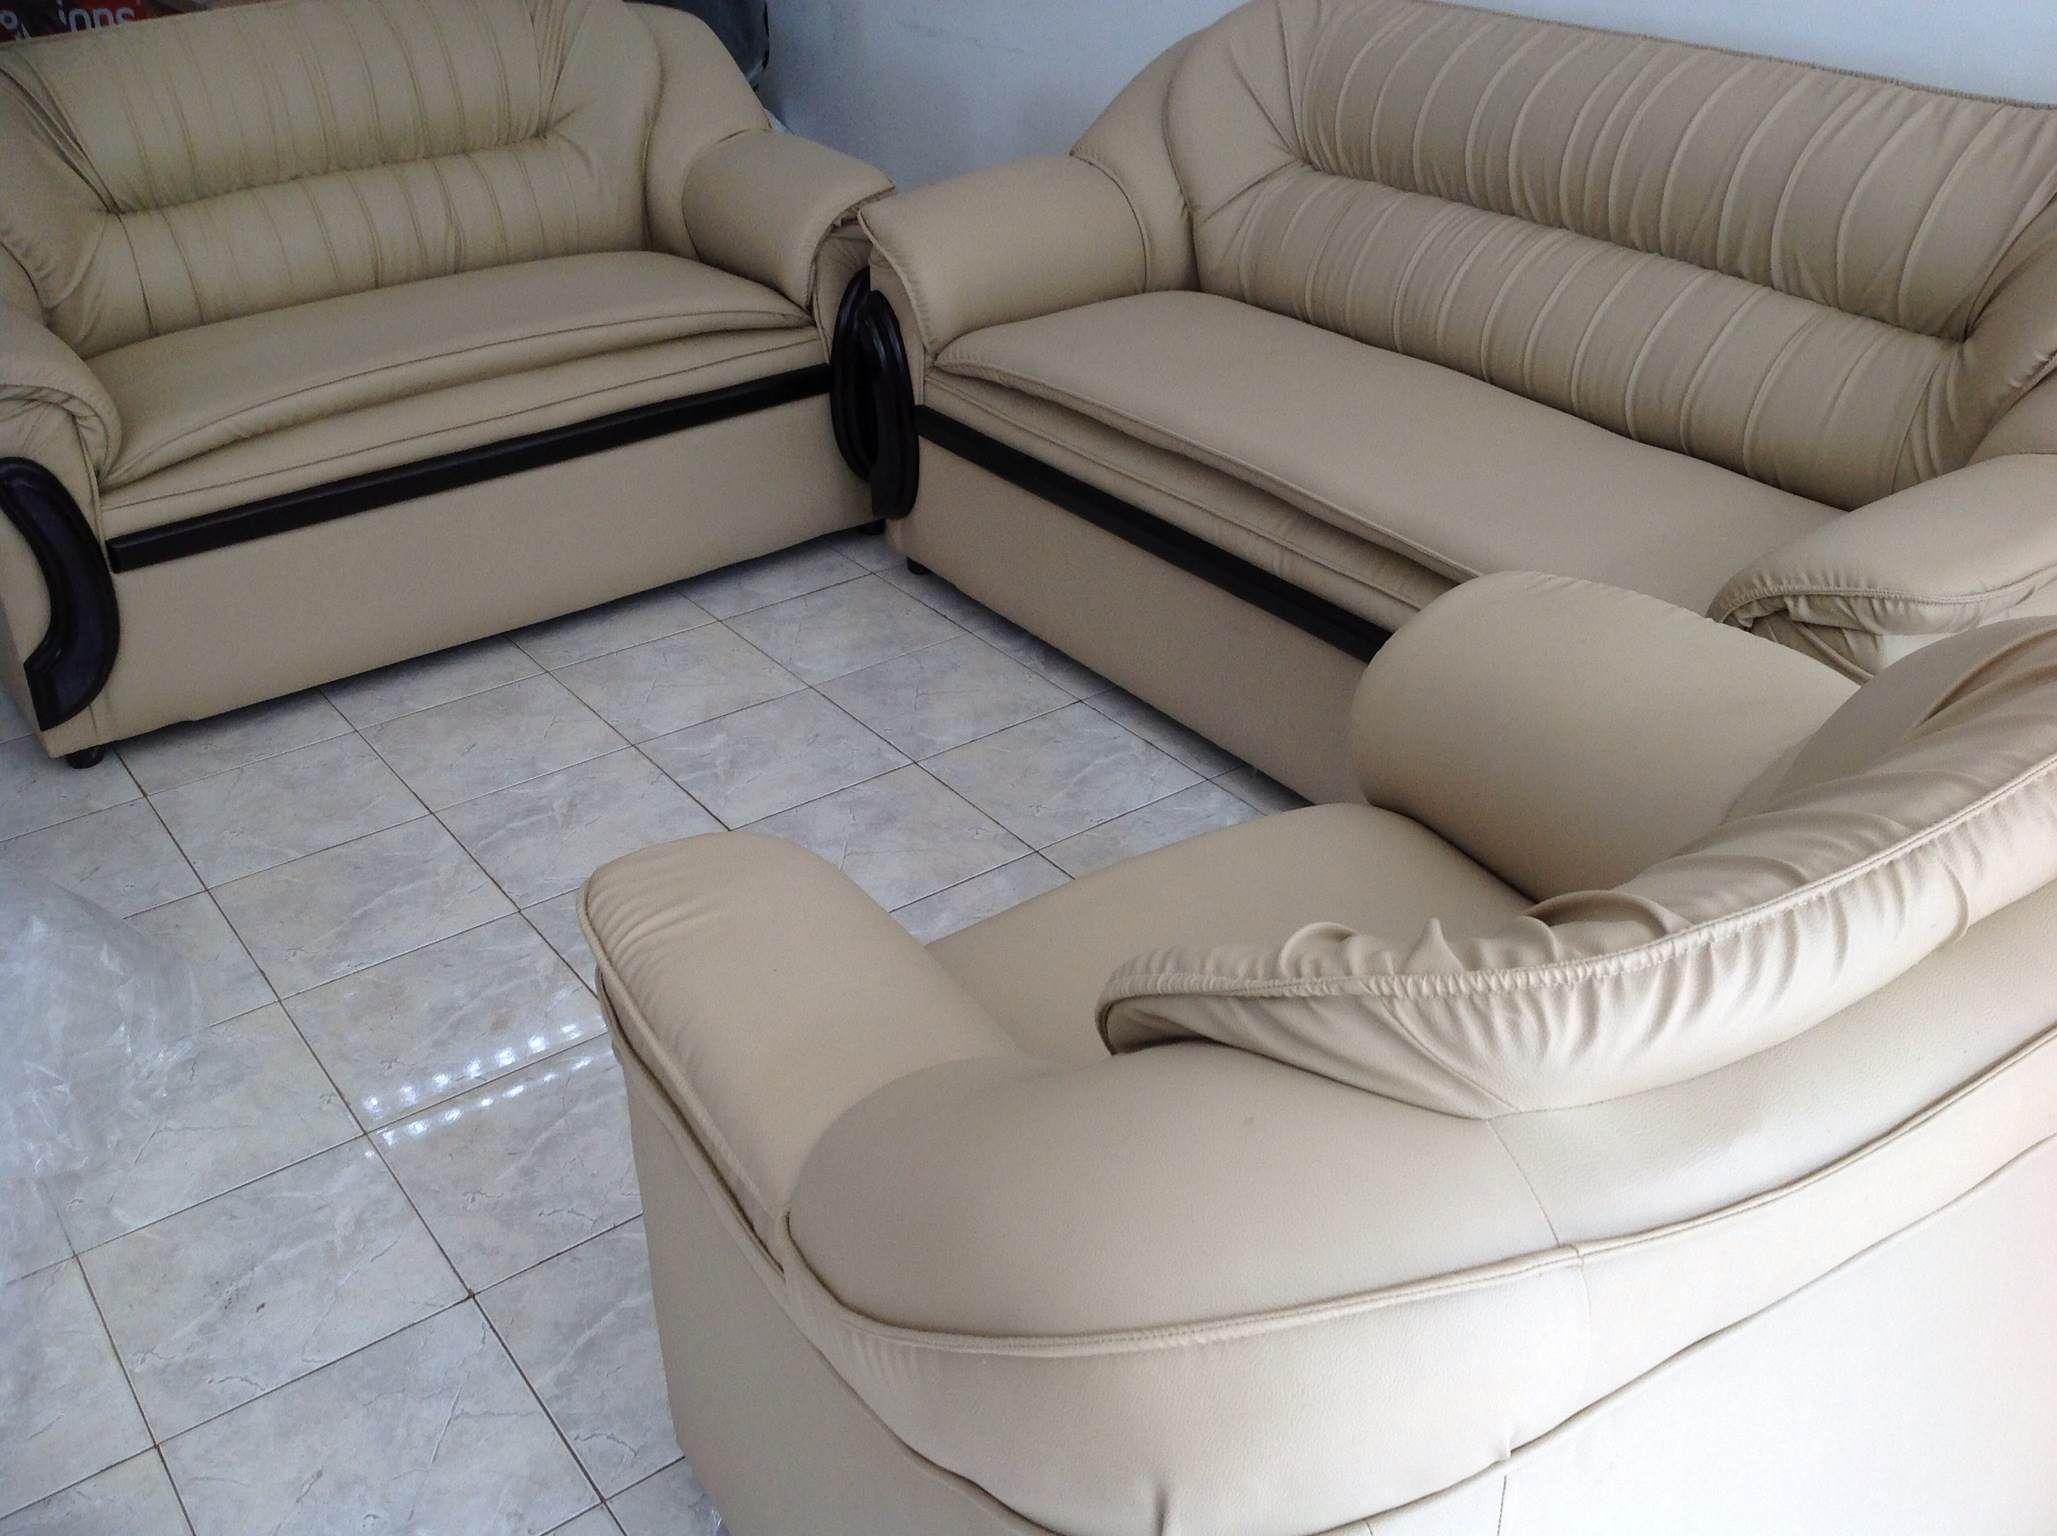 Rexine Sofa 3 2 1 Living Room Furniture Furniture Room Furniture